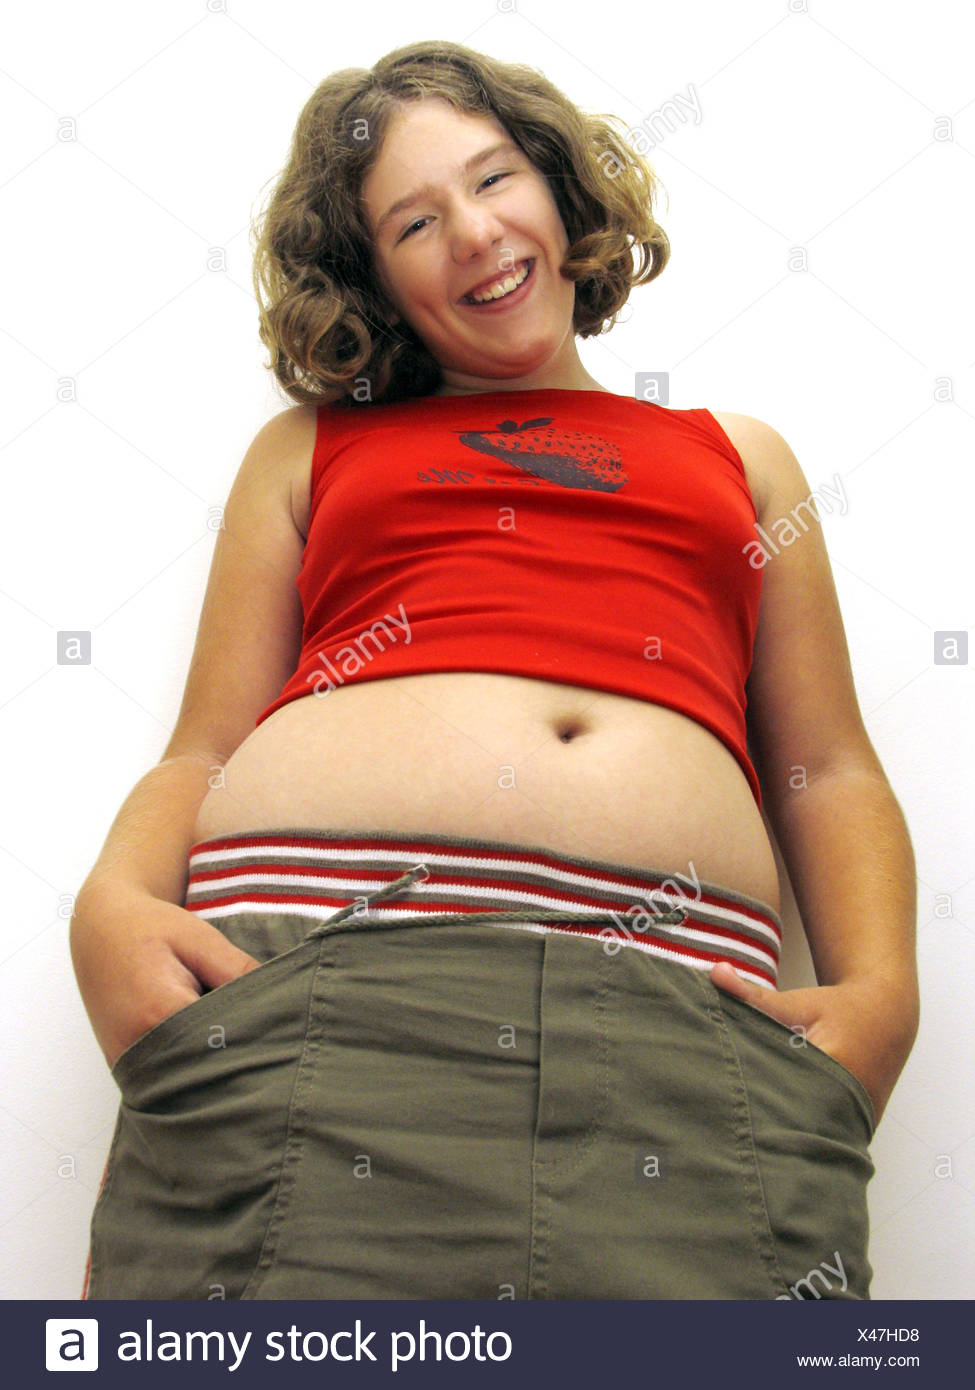 Chubby Girl Tube